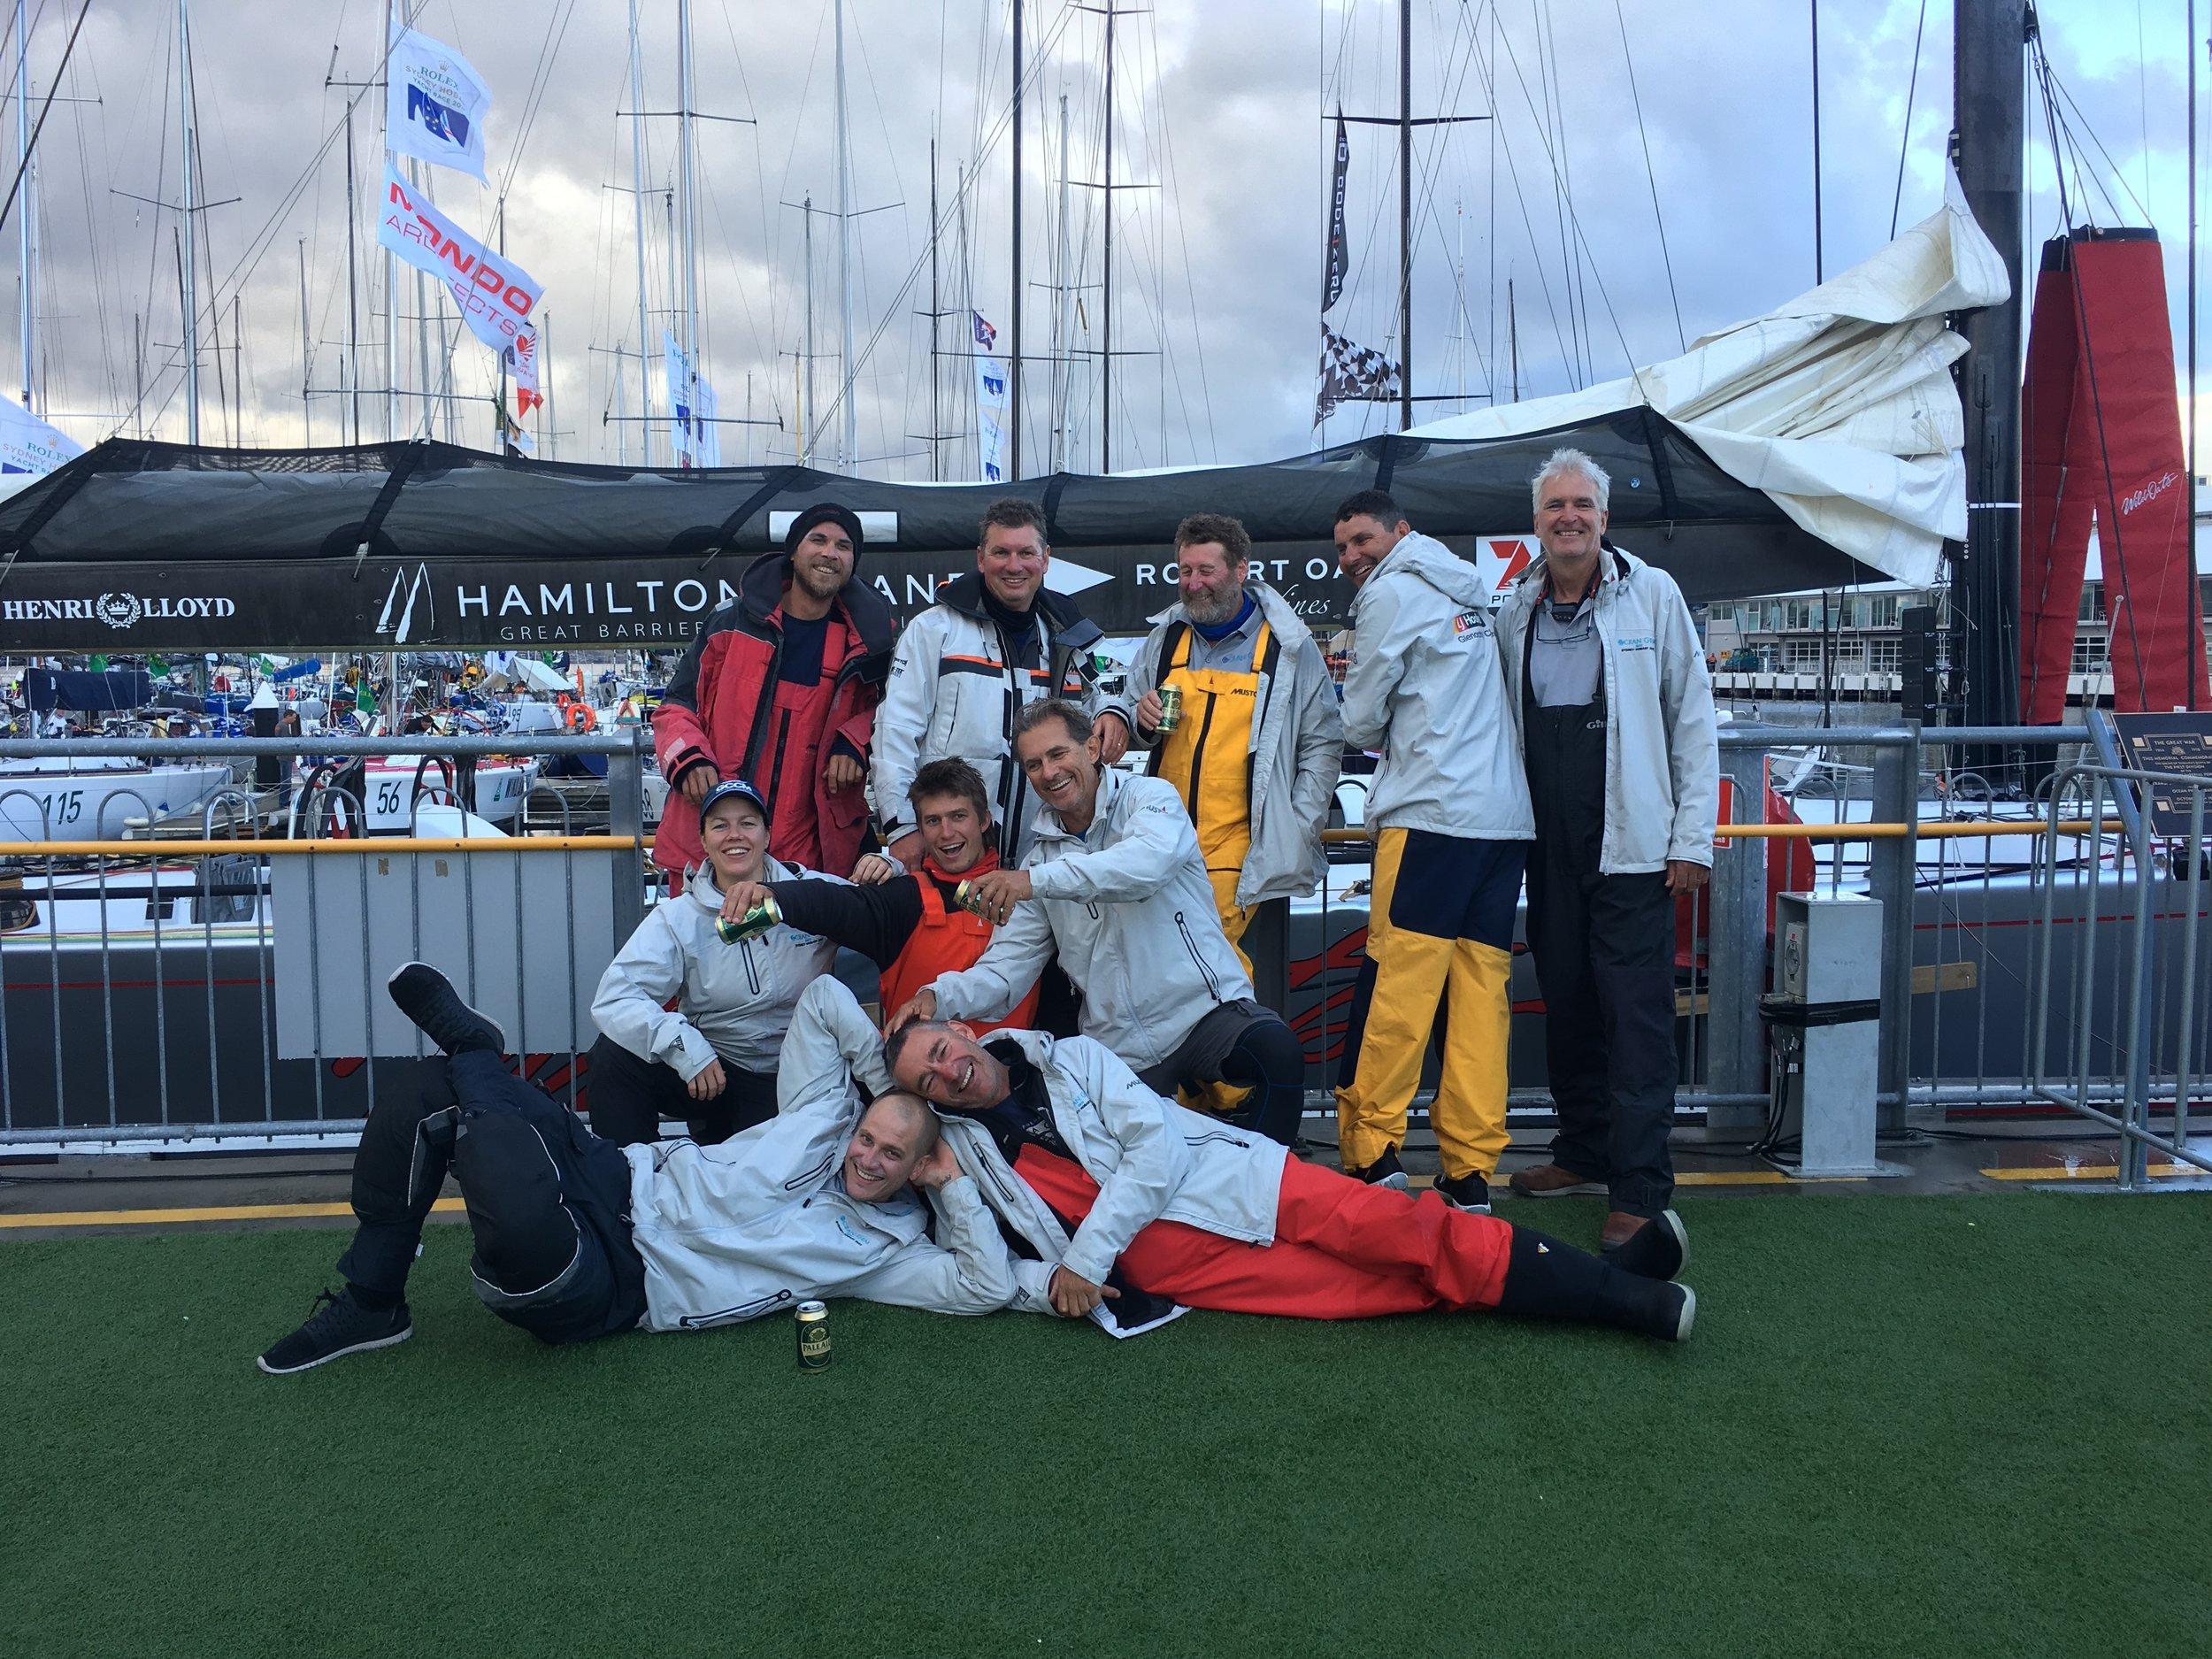 Sydney Hobart Race 2017 - Rolex Sydney Hobart